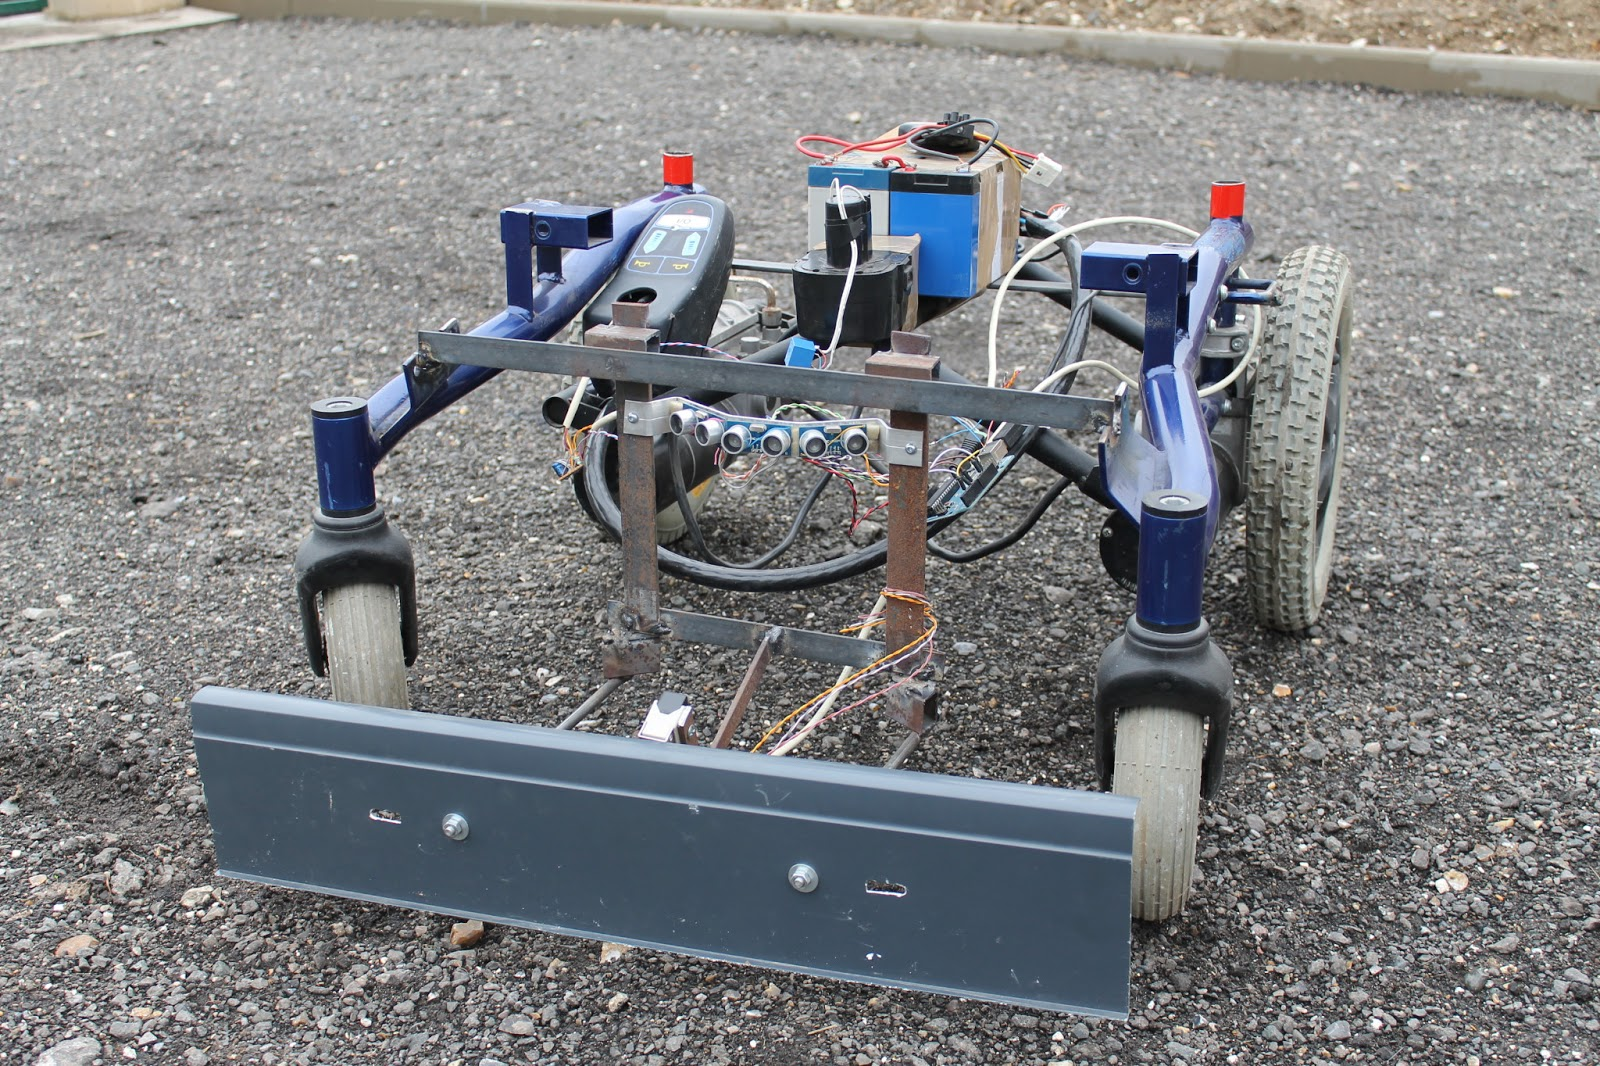 Gt diy cutflower tondeuse robot par arduino essai